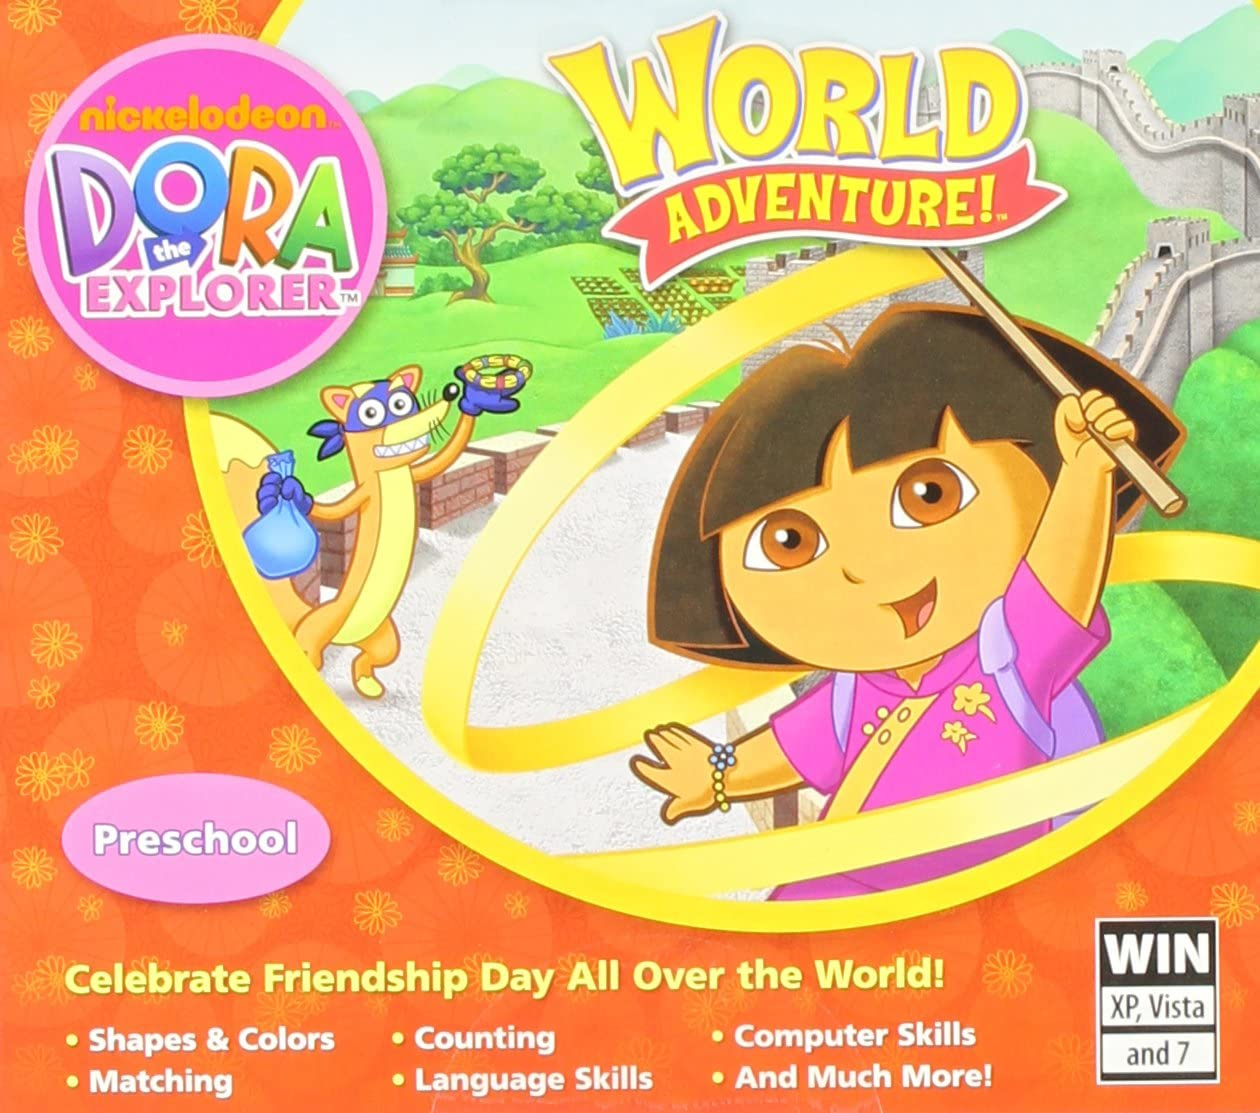 Amazon.com: Dora The Explorer:World Adventure (JC) - PC: Video Games